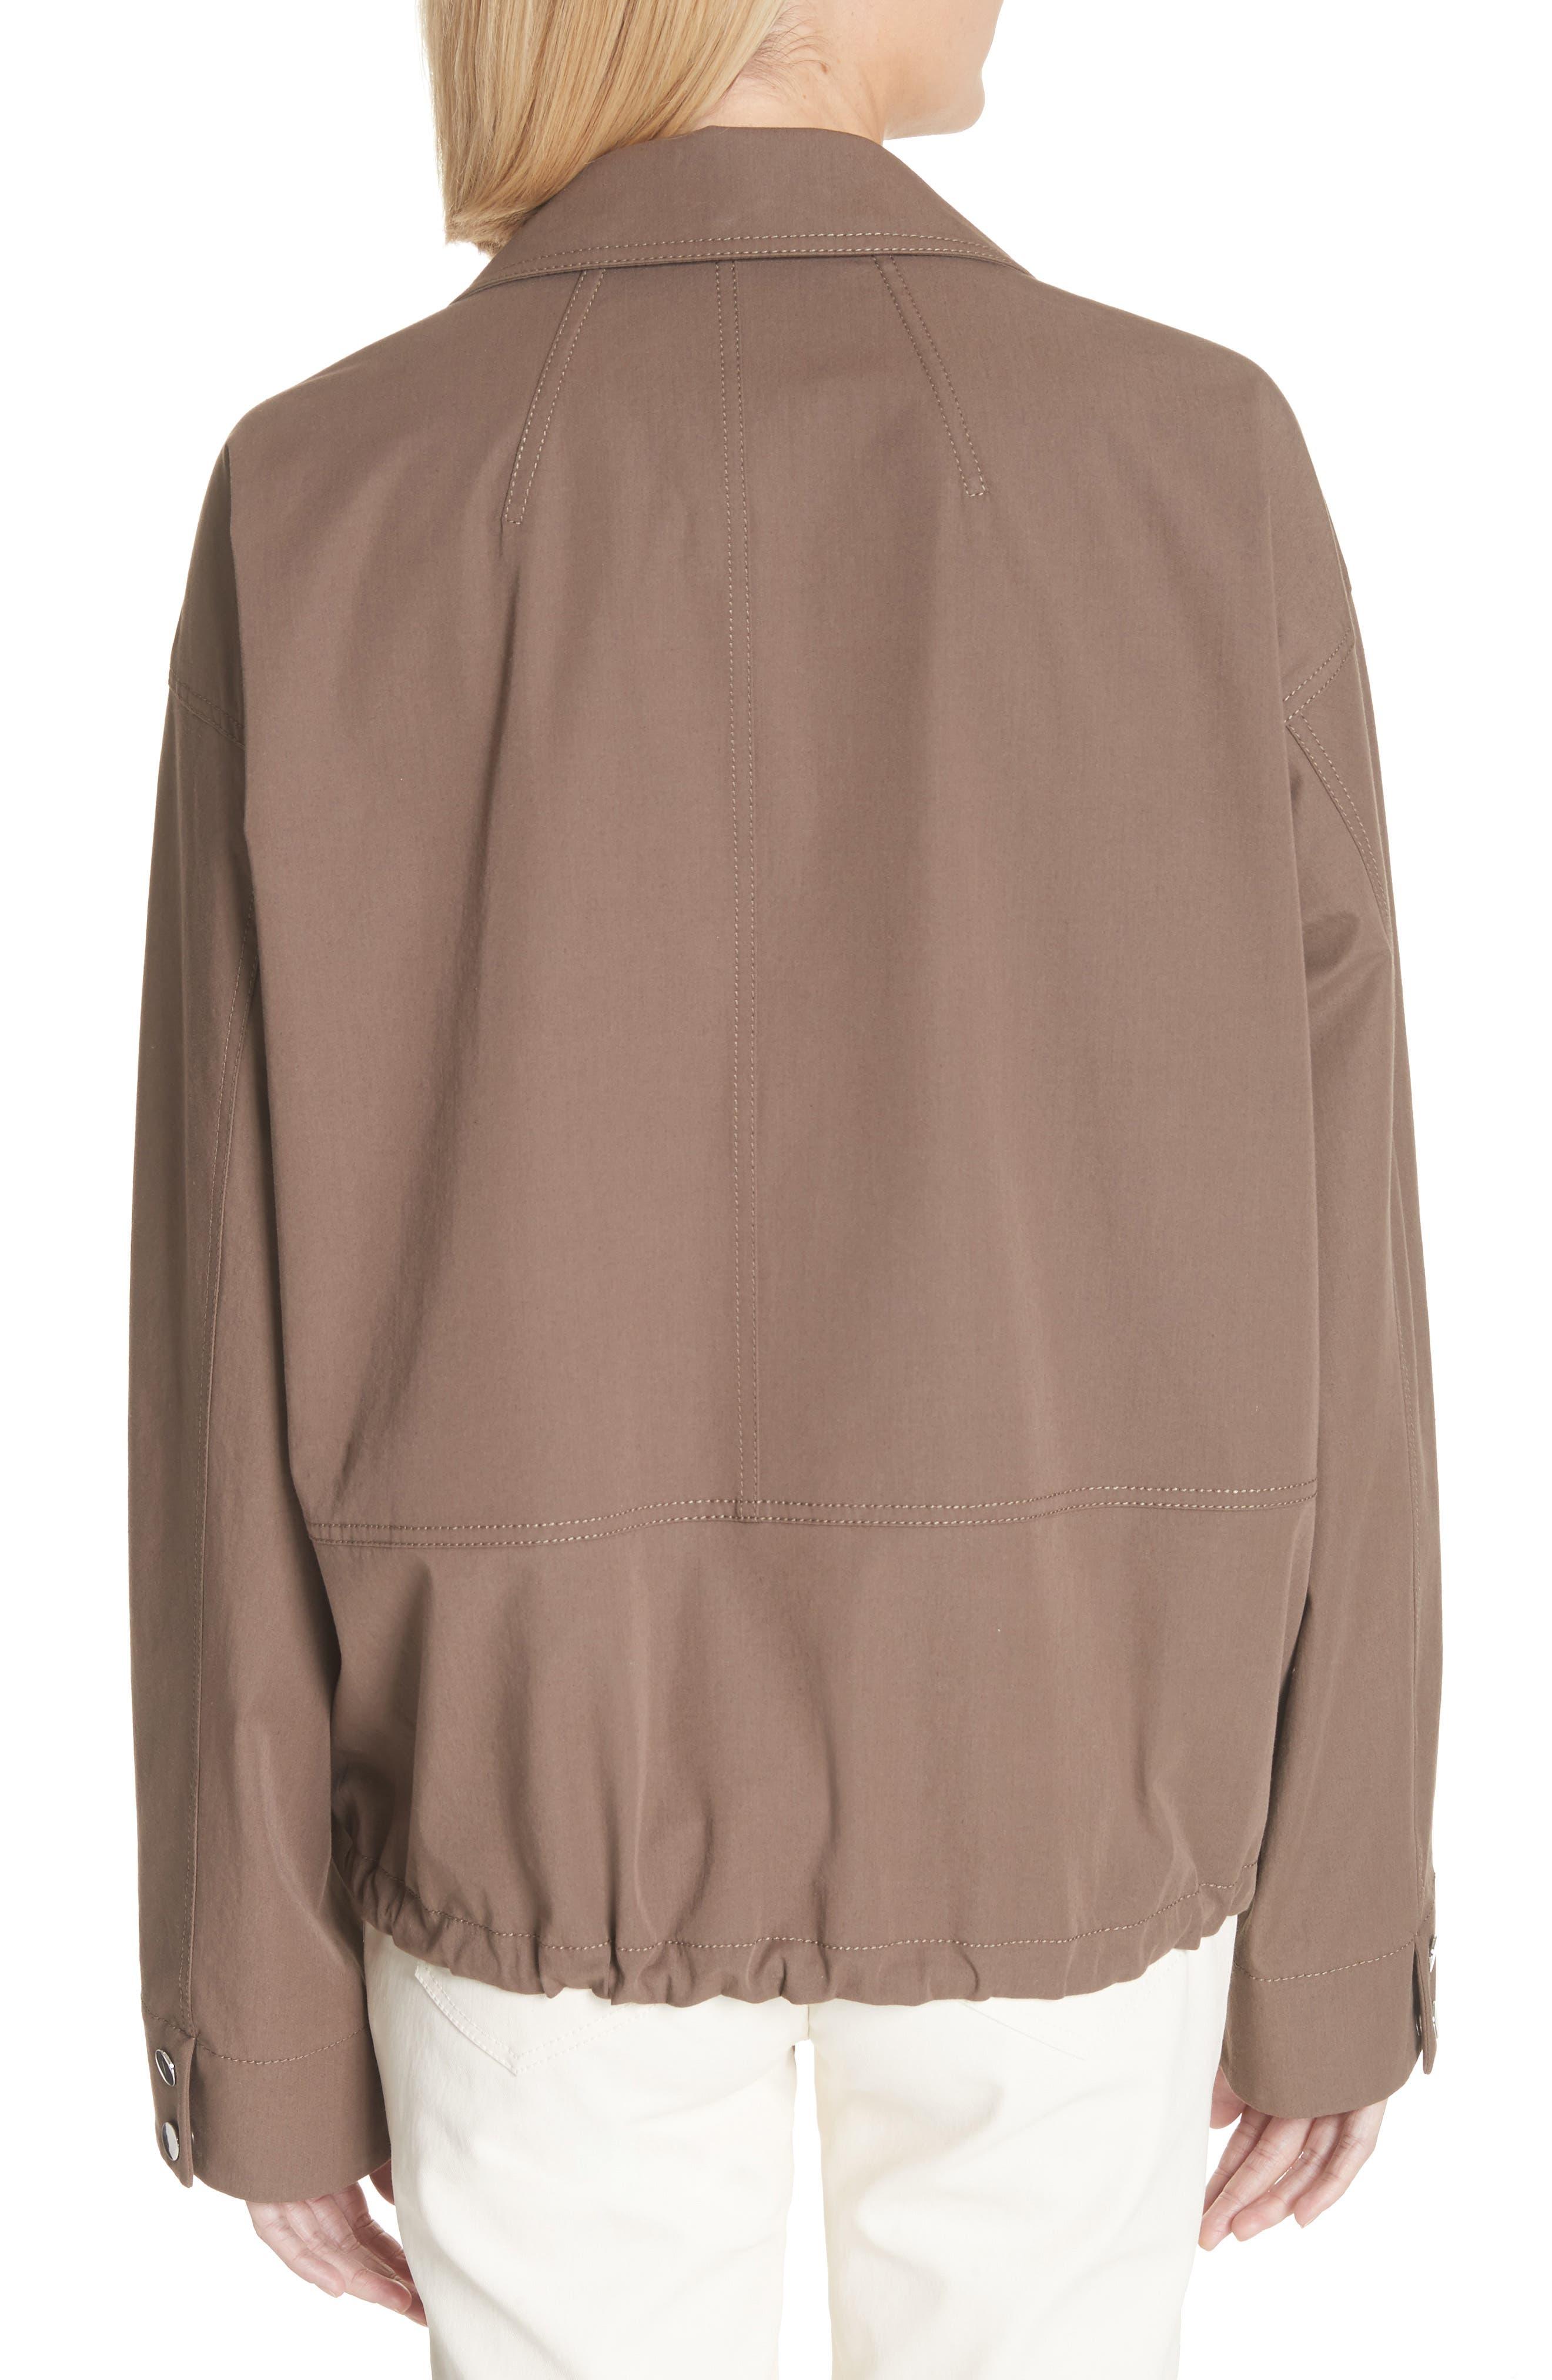 Maxton Jacket,                             Alternate thumbnail 2, color,                             Nougat